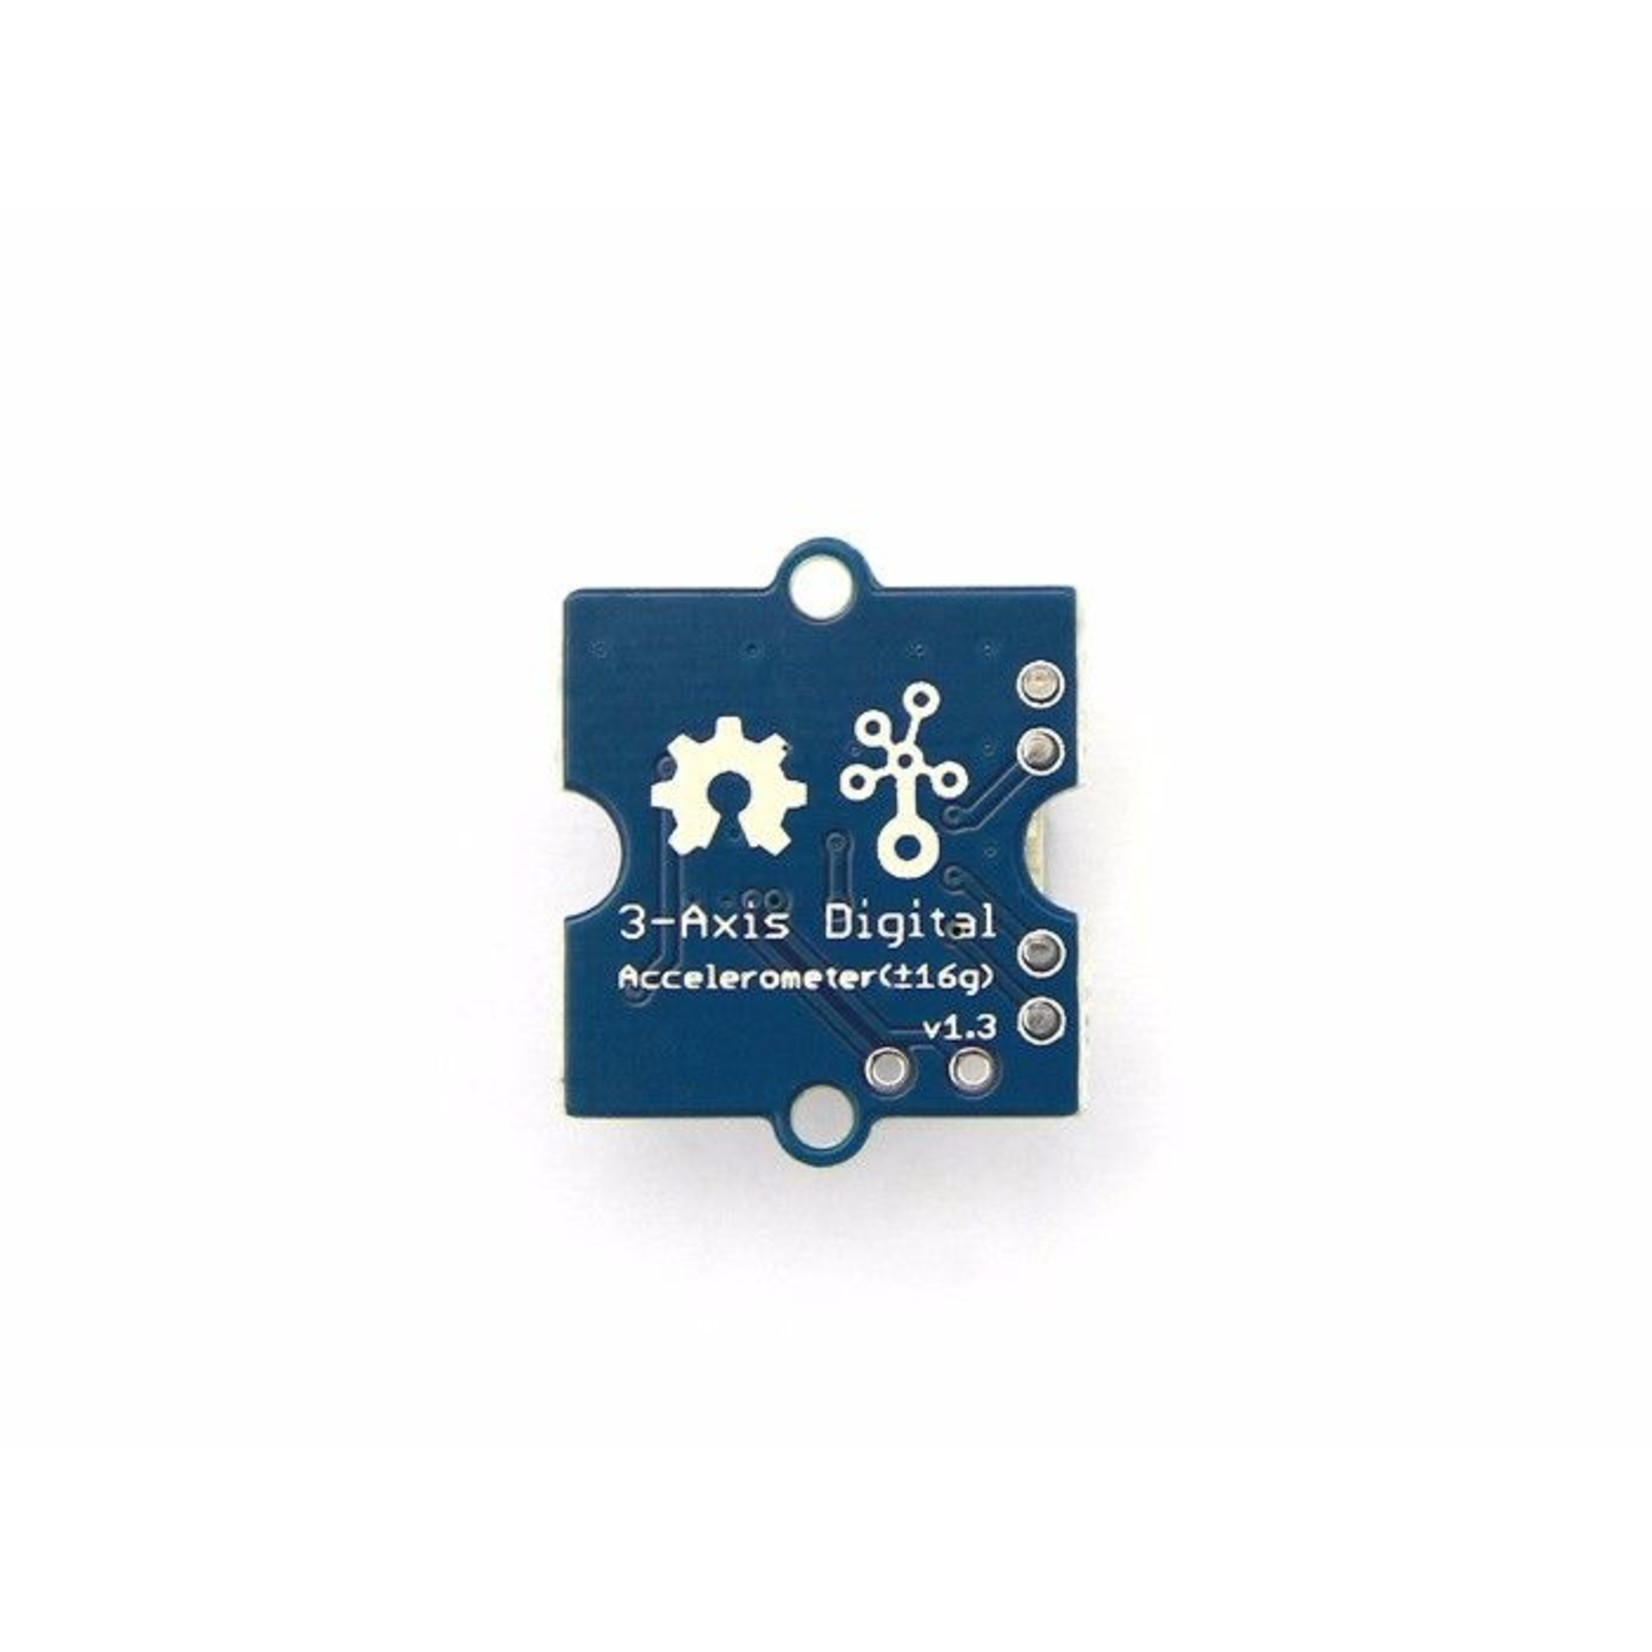 Seeed Grove - ADXL345 - 3-Axis Digital Accelerometer(±16g)